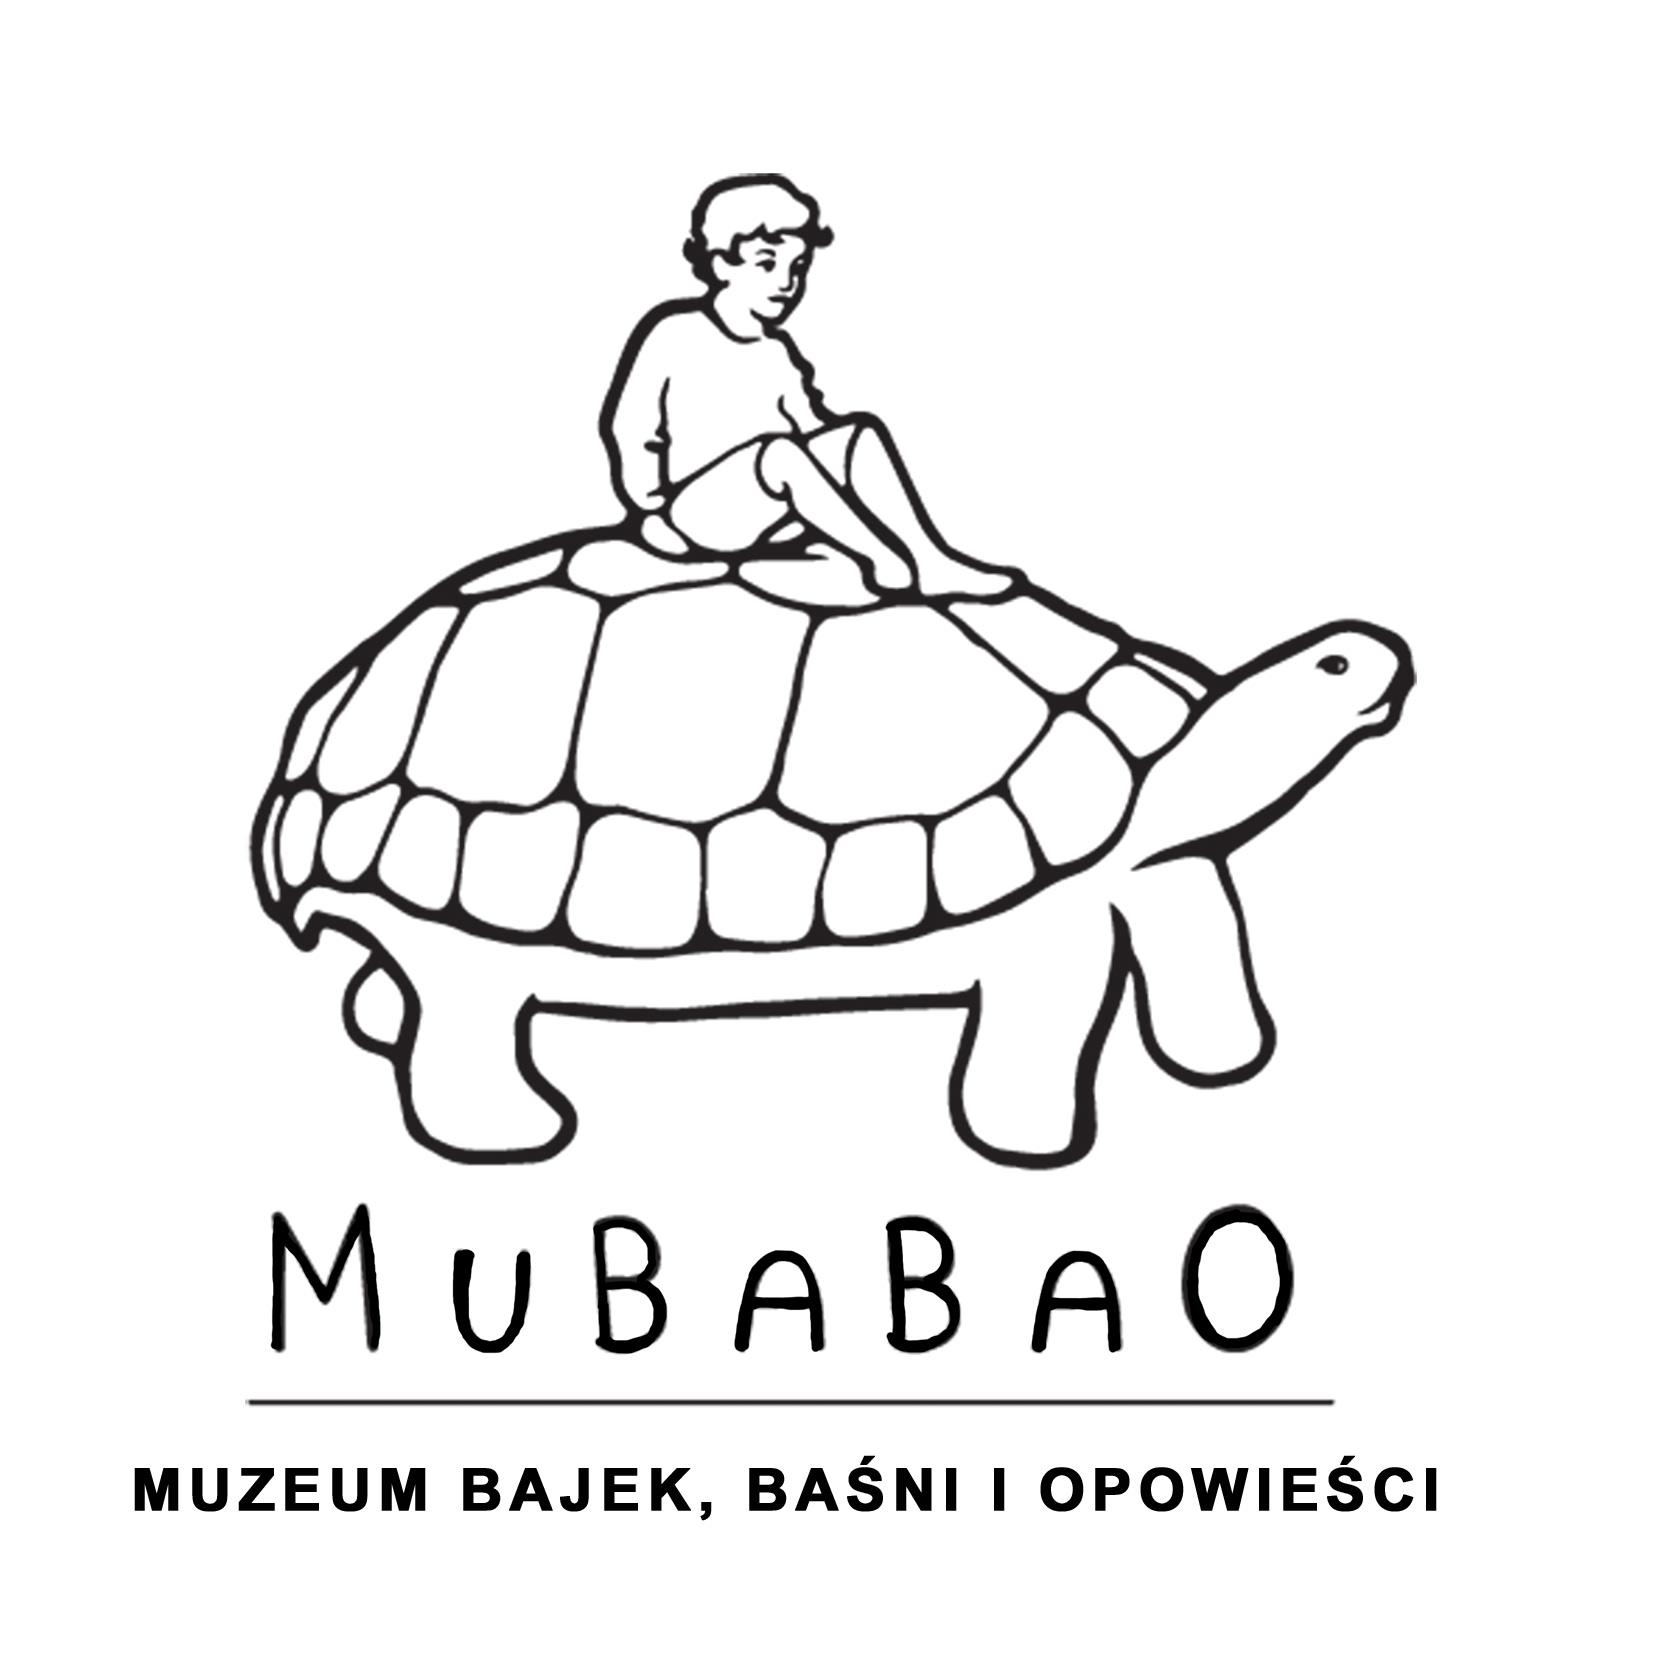 mubabao-logo-2017